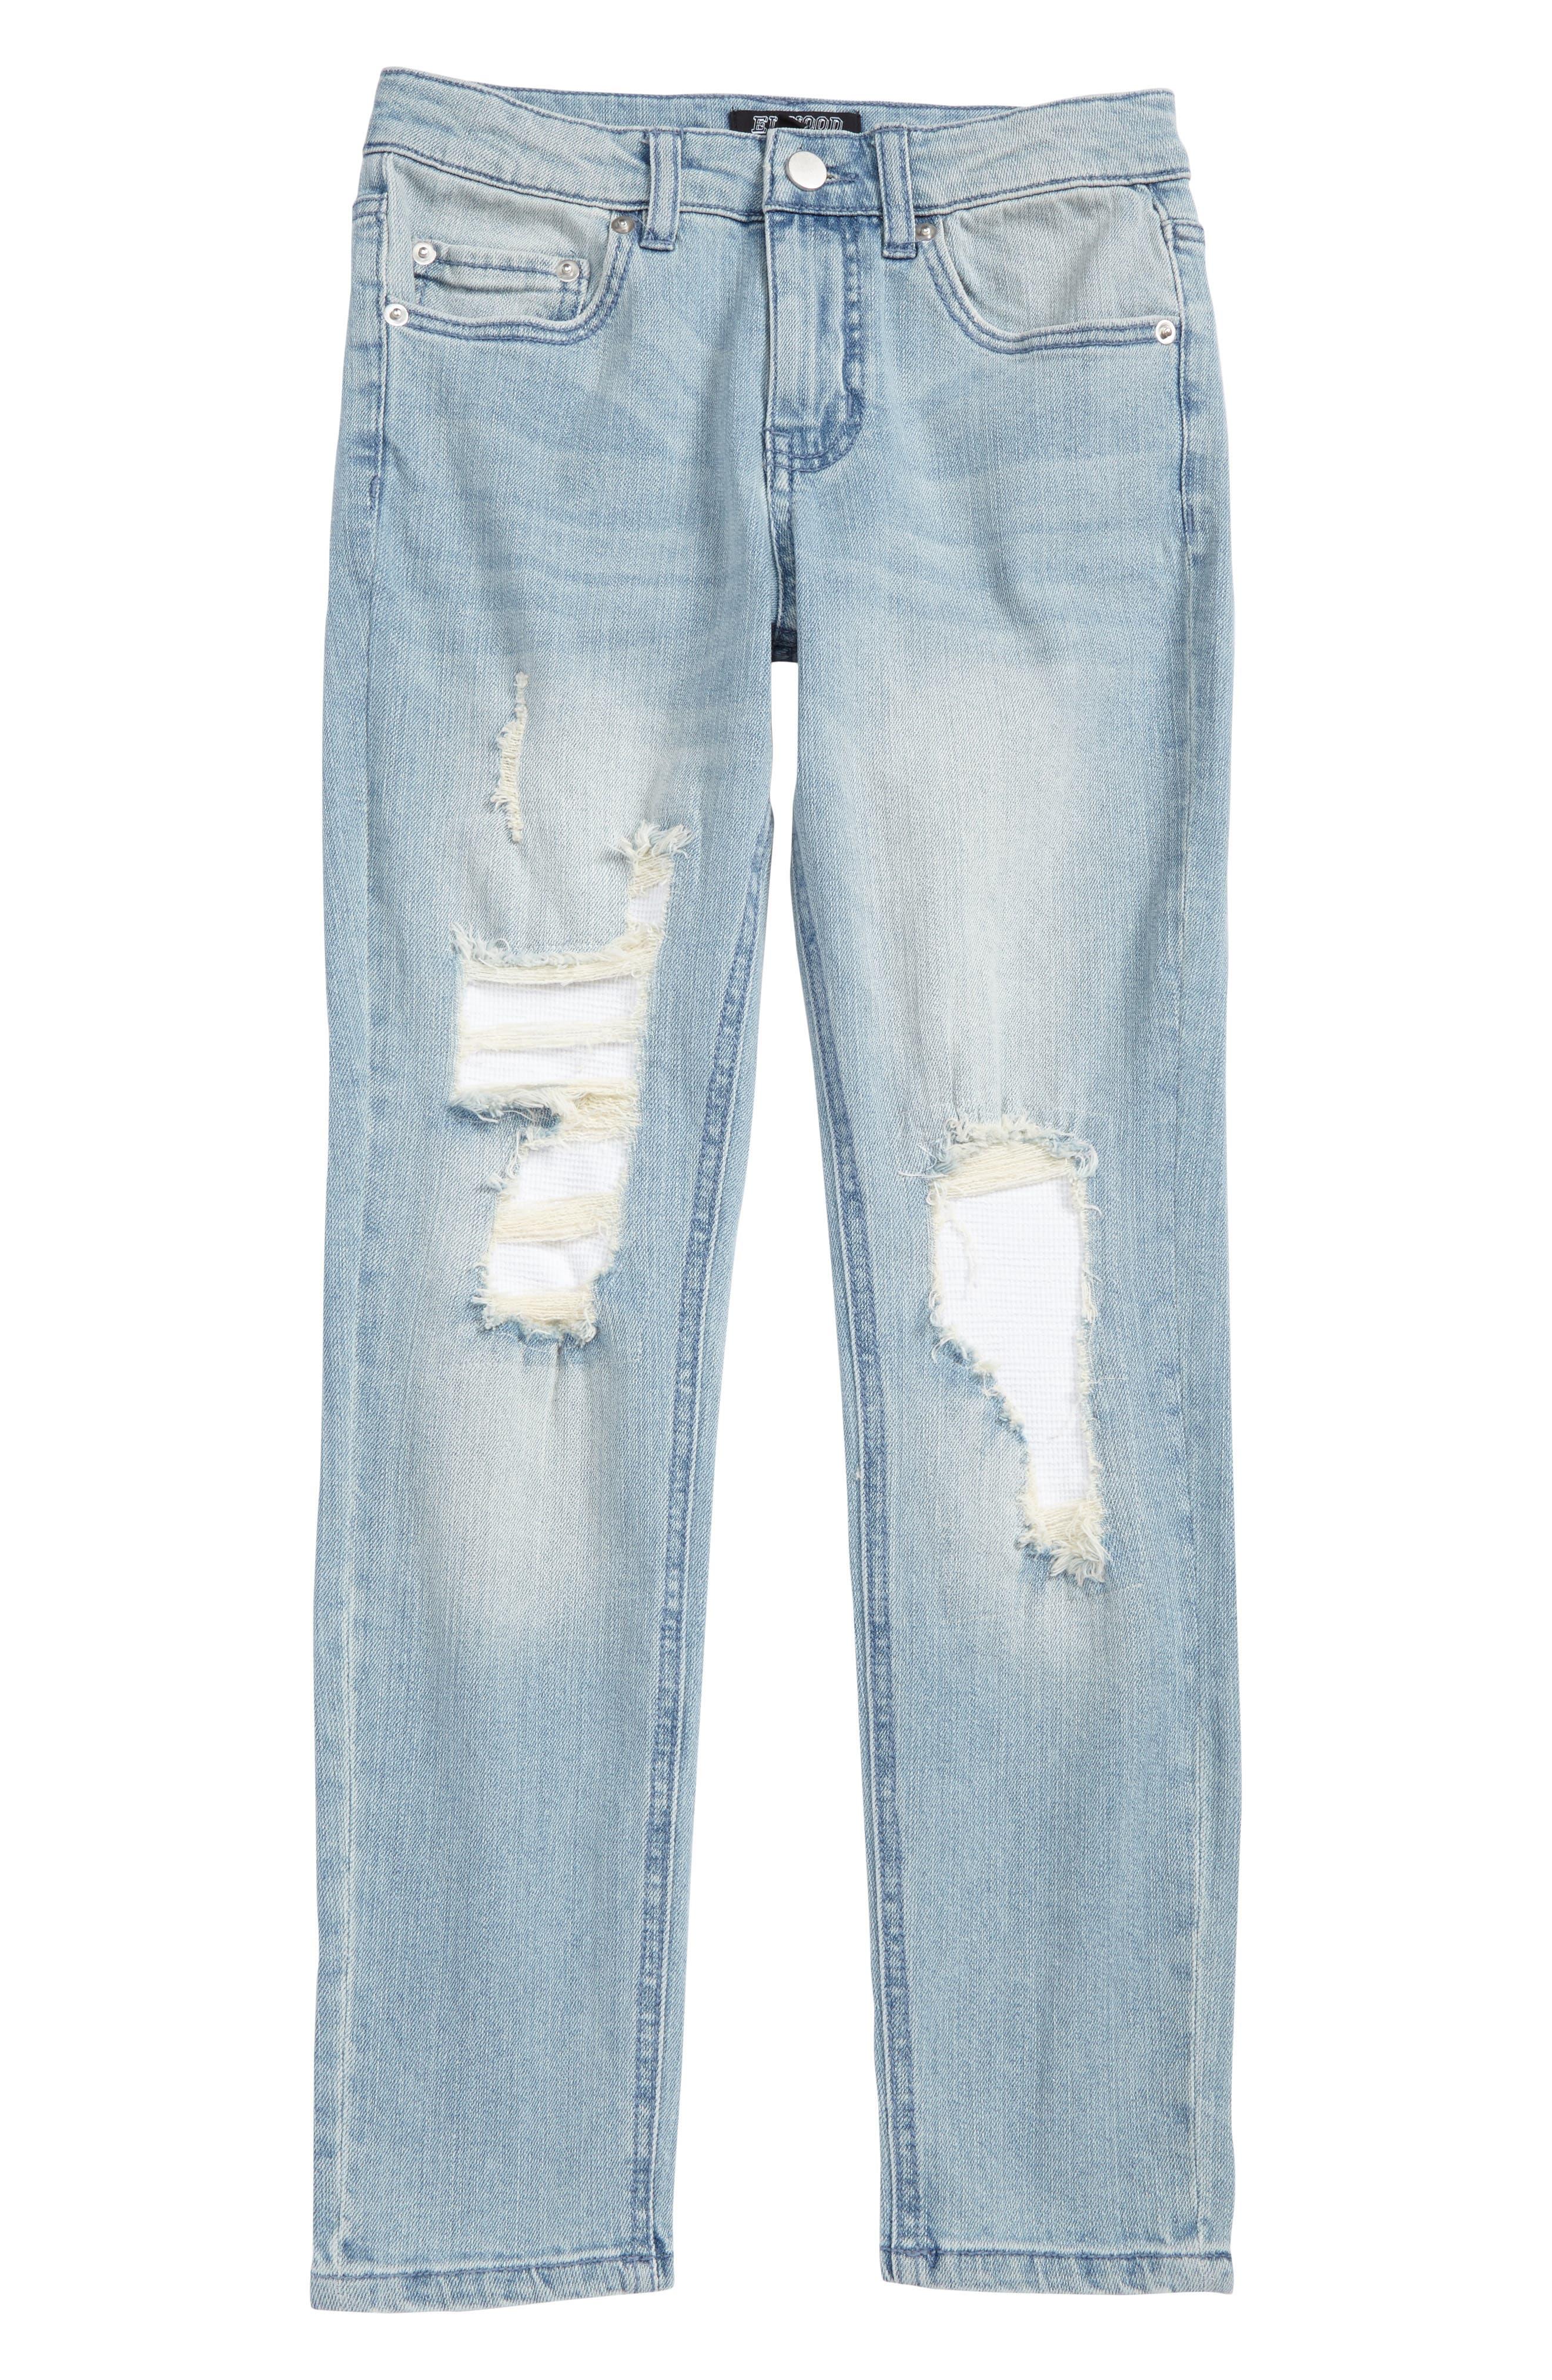 Rip & Repair Straight Leg Jeans,                         Main,                         color, Light Indigo